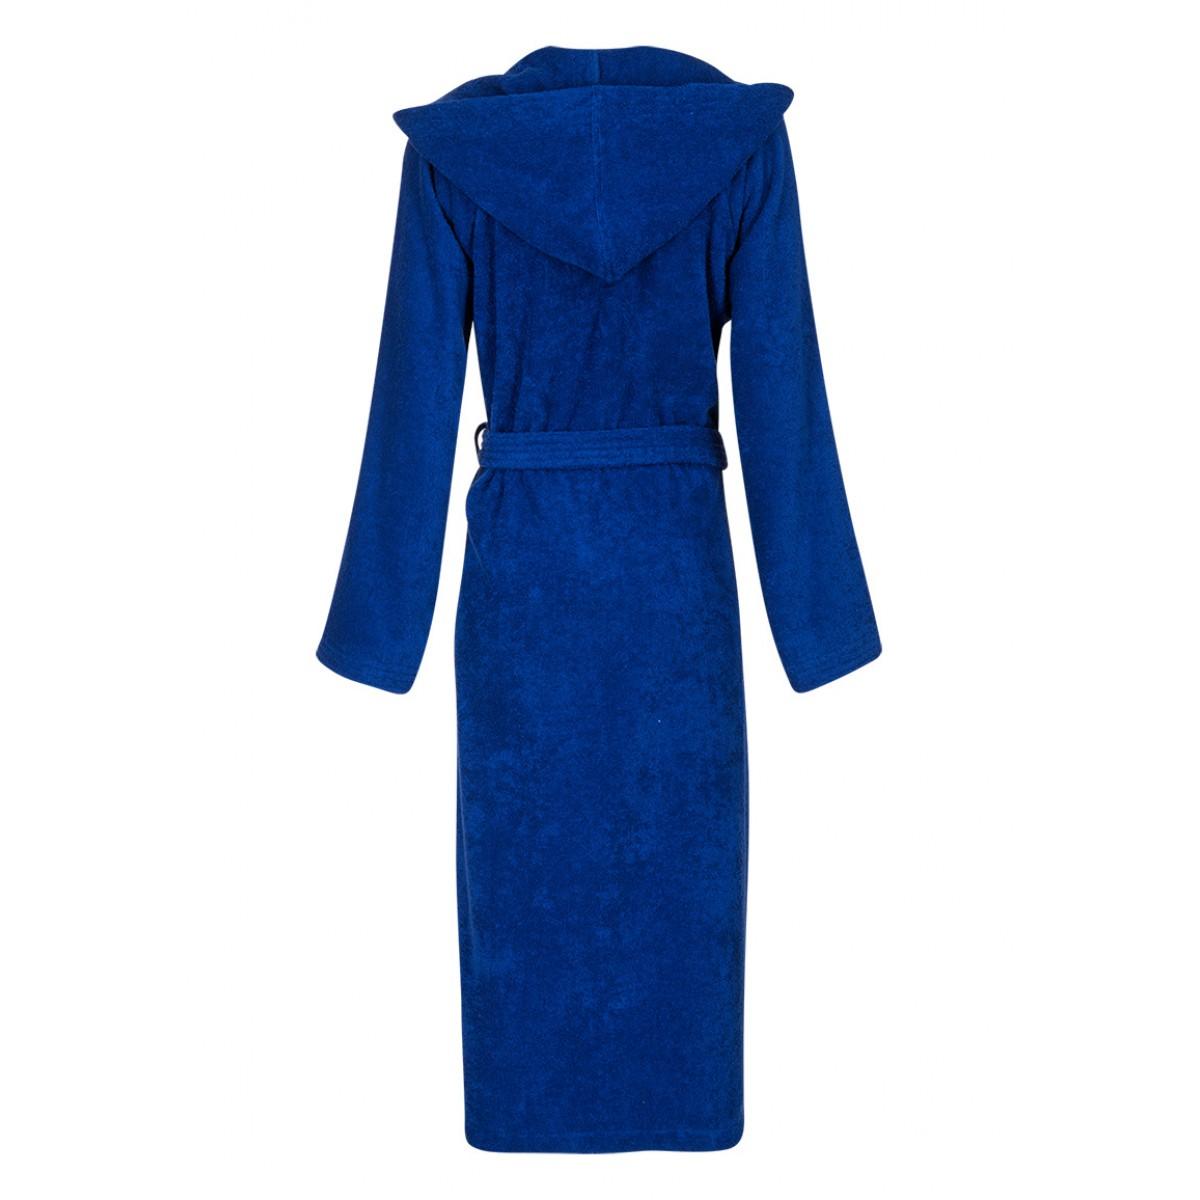 Kobaltblauwe badjas unisex